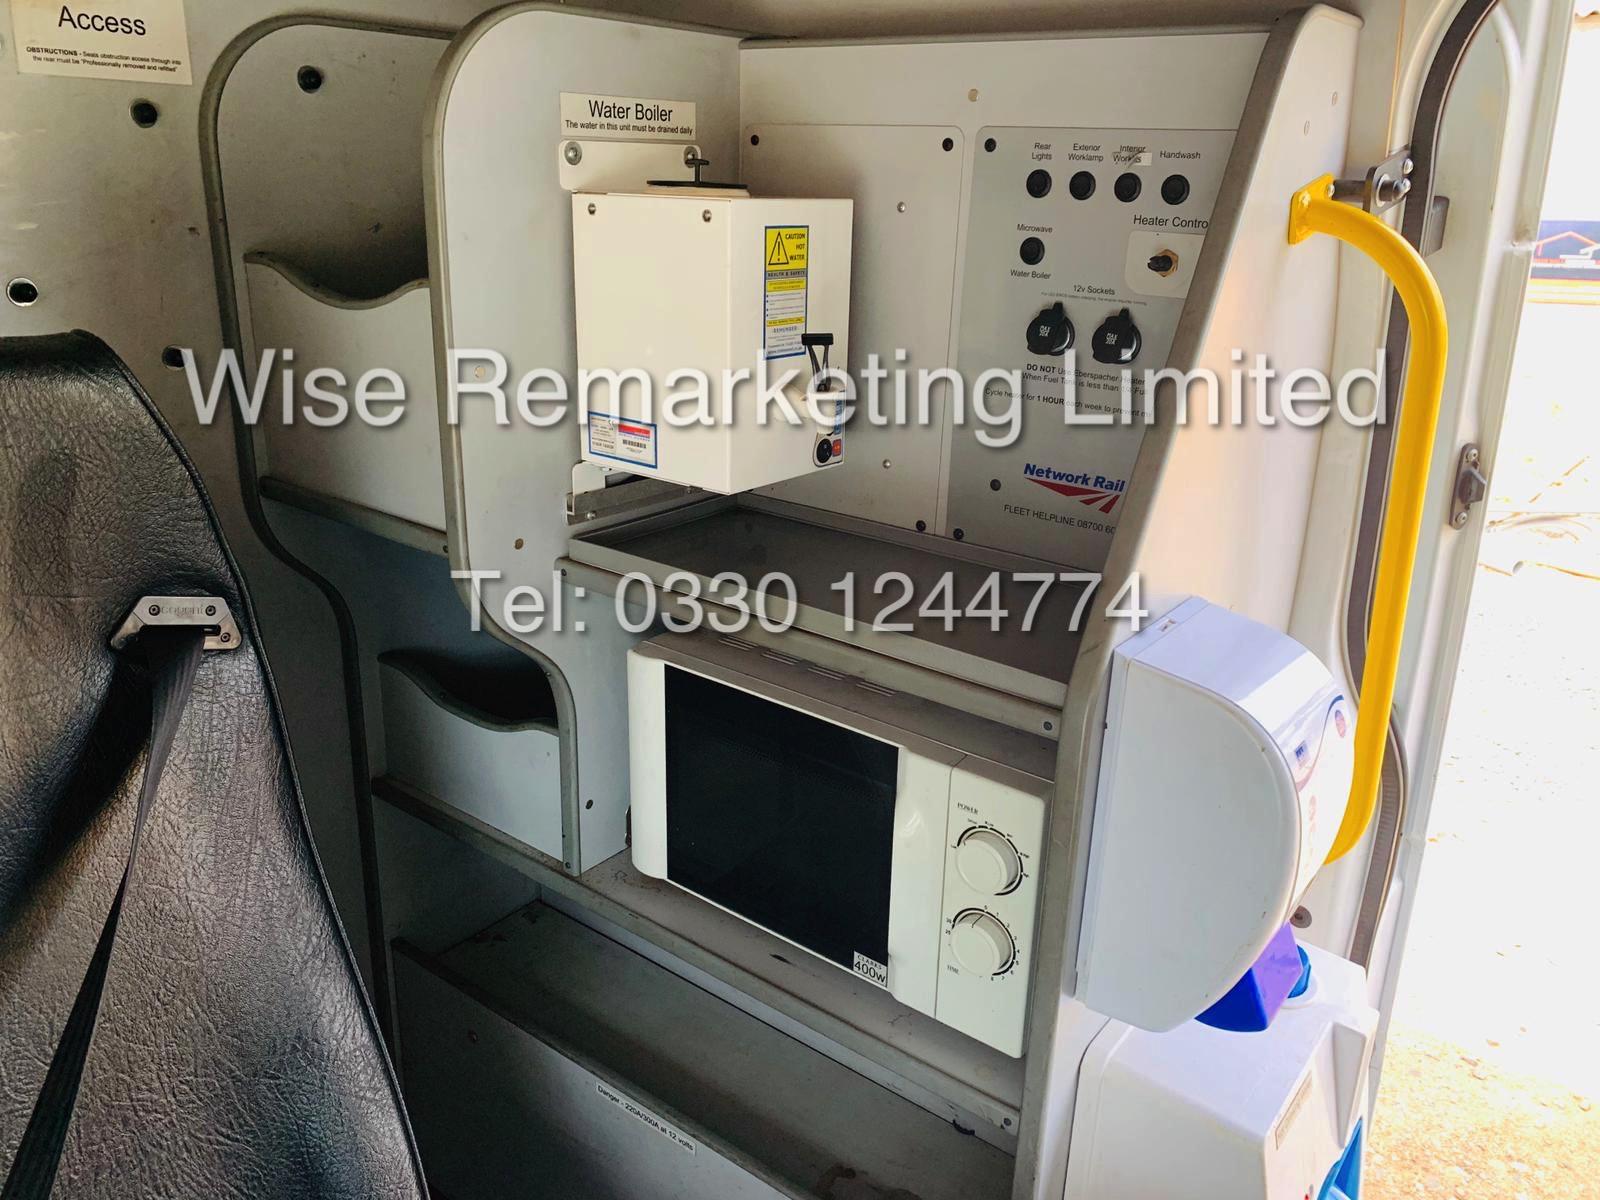 (RESERVE MET) FORD TRANSIT T350L 2.4 TDCI *8 SEATER CREW VAN* (MESSING UNIT) *1 OWNER* 11 REG - Image 16 of 21